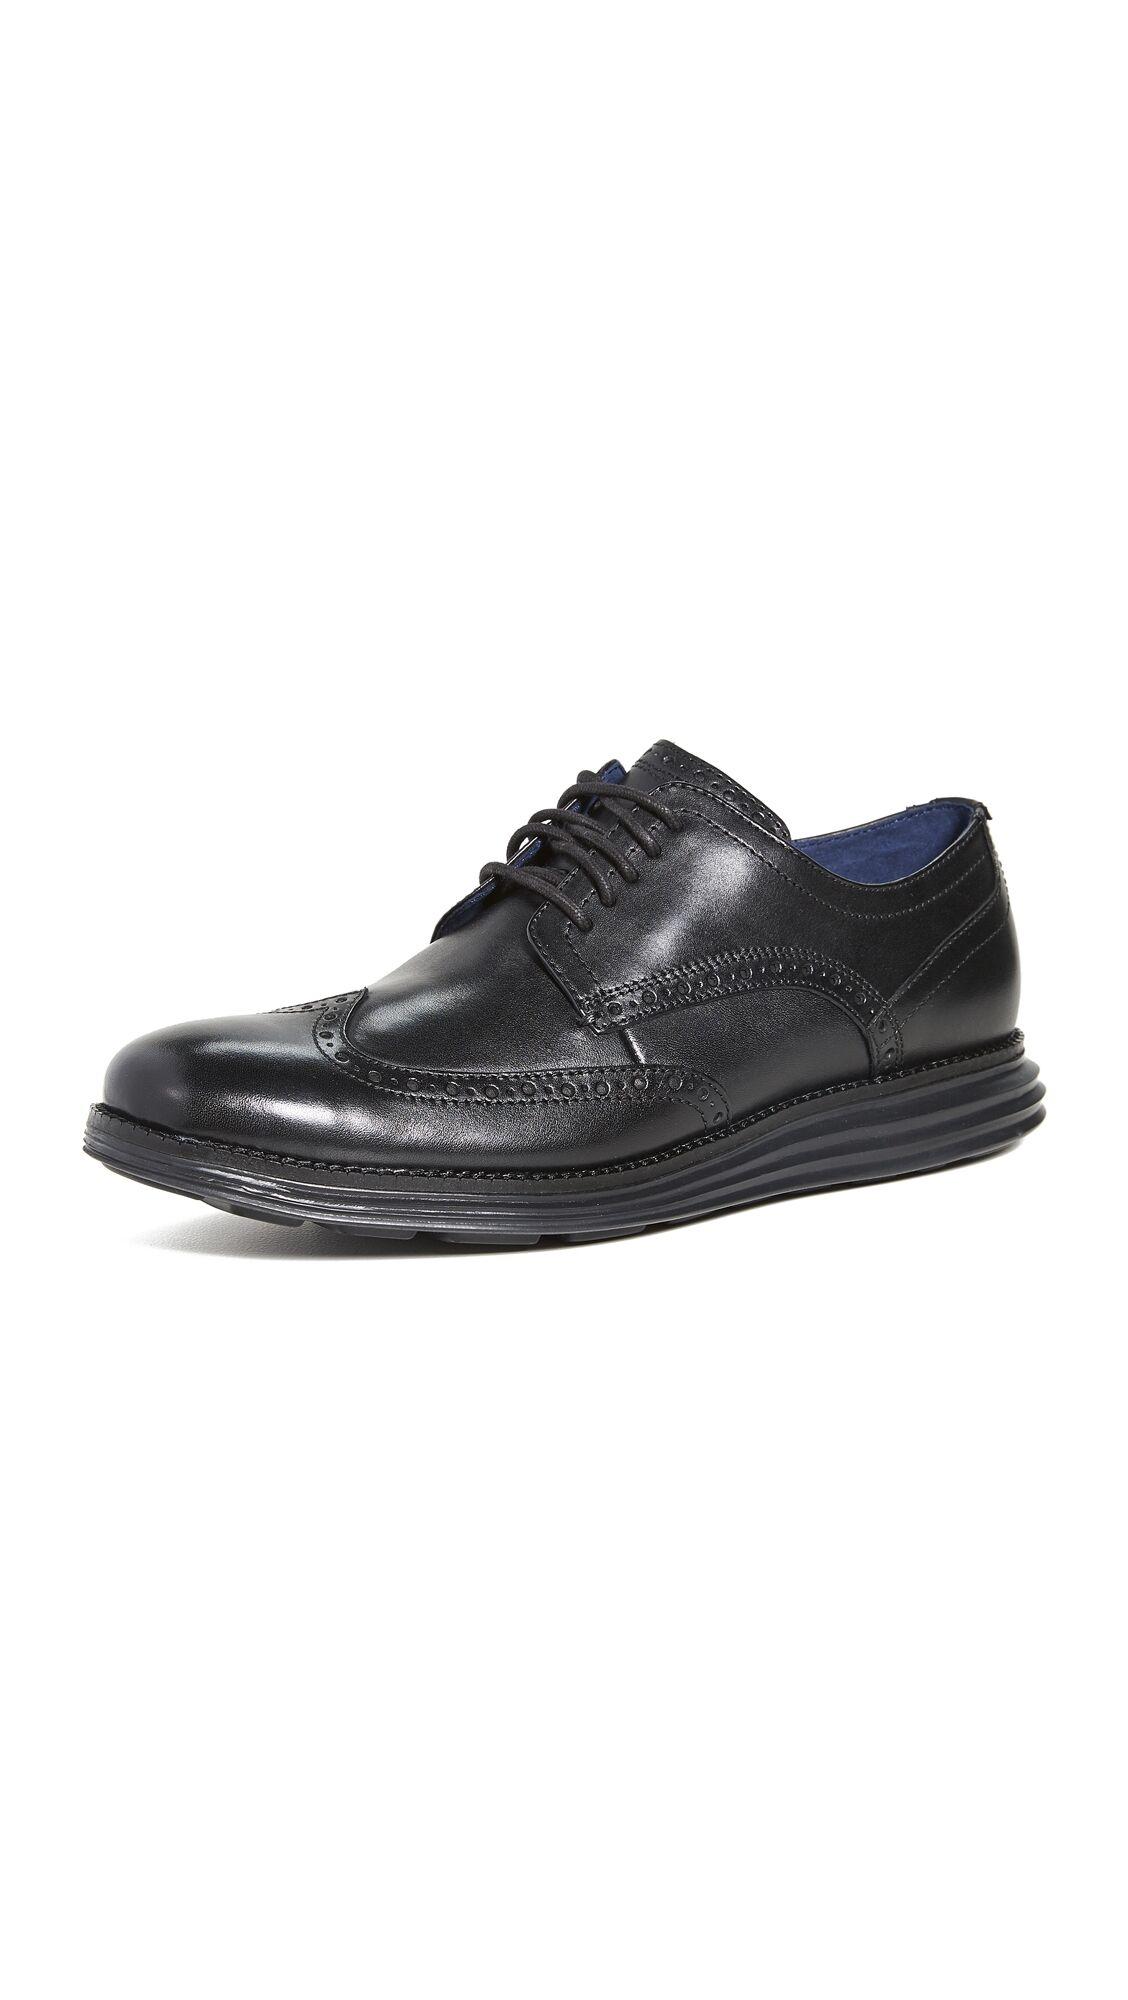 Cole Haan Original Grand Wingtip Oxford Shoes - Black/Black - Size: 9.5